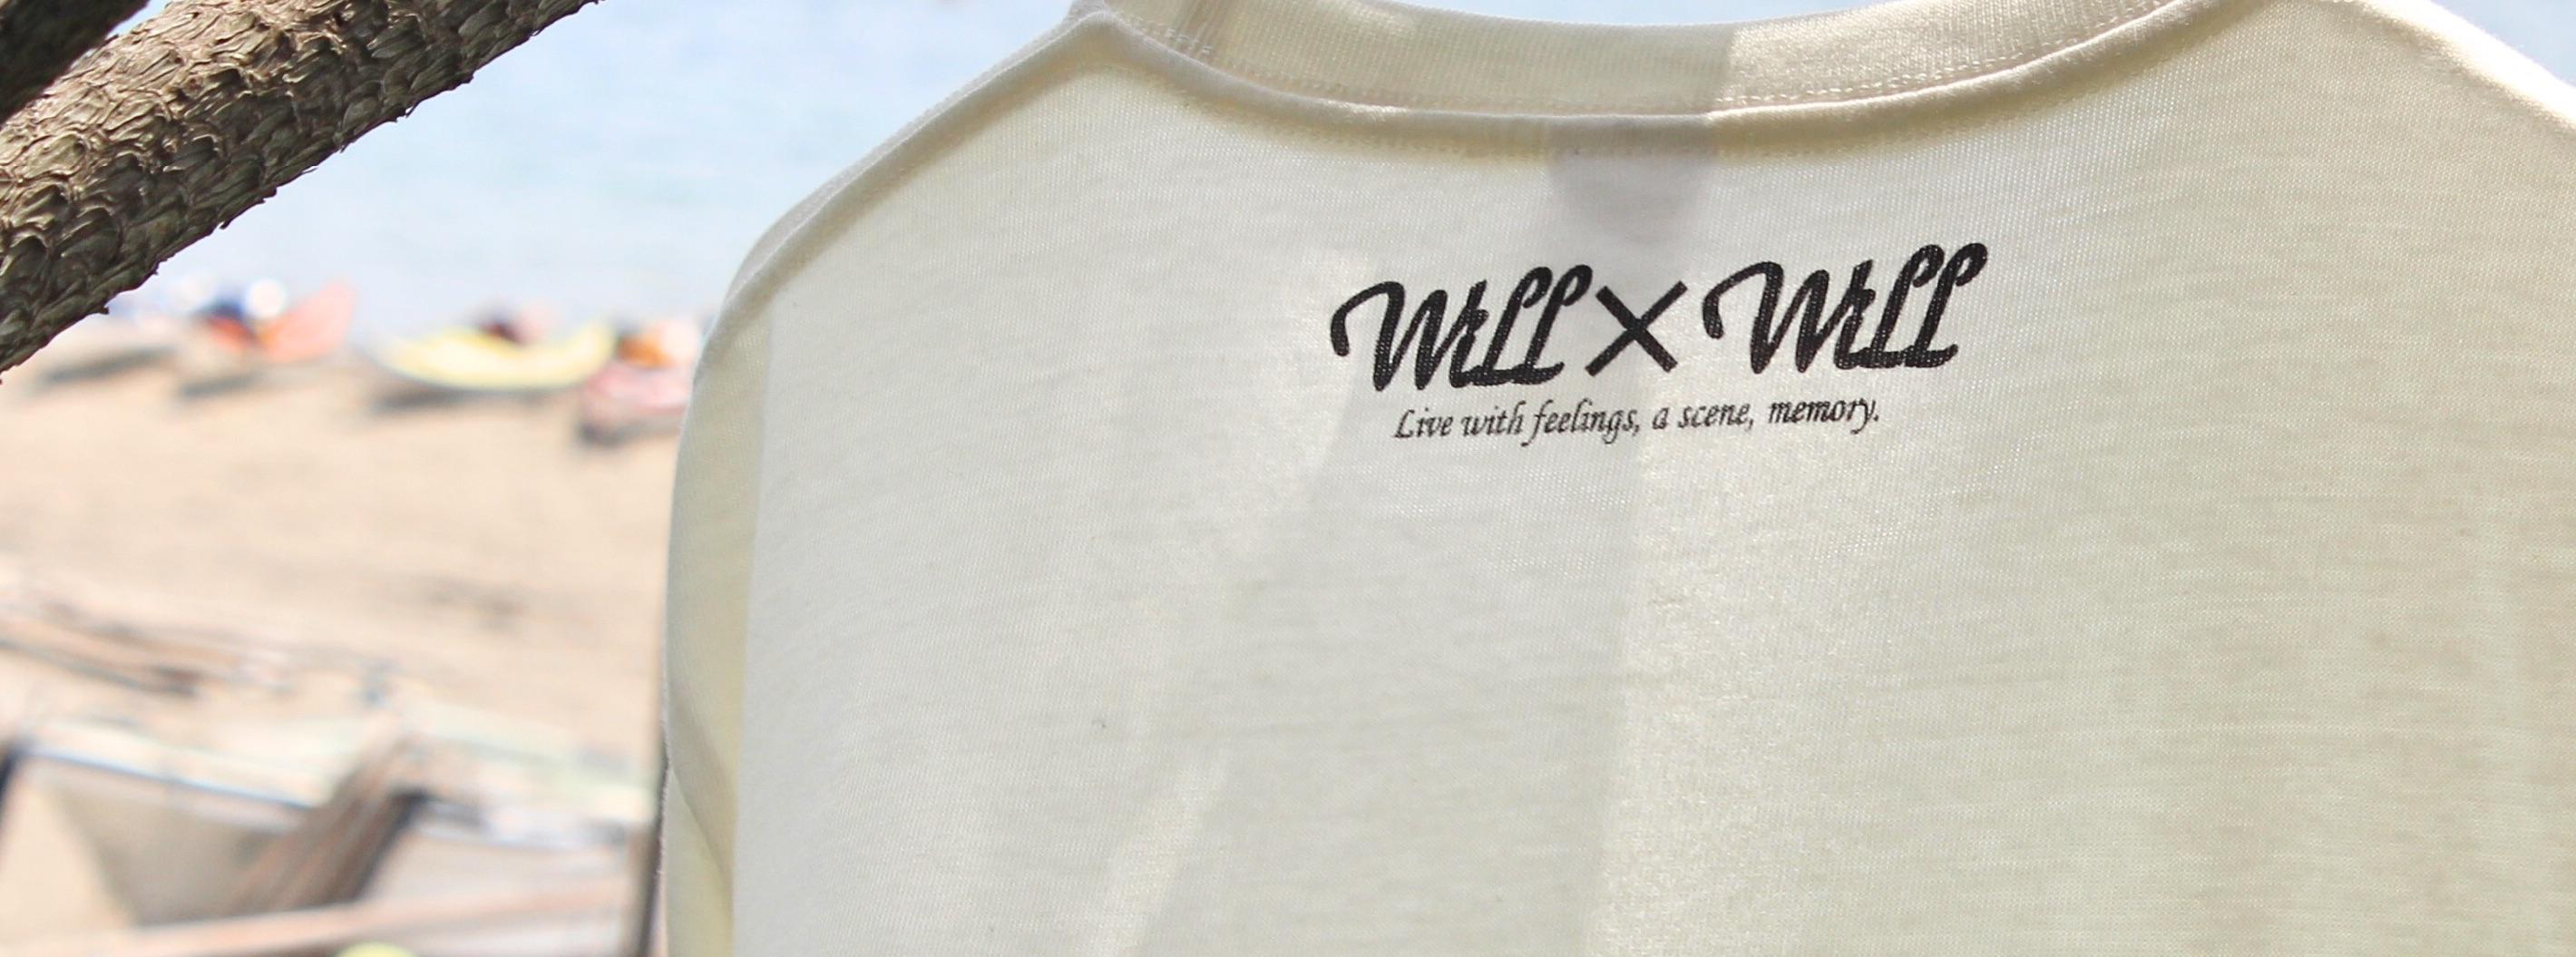 willxwill